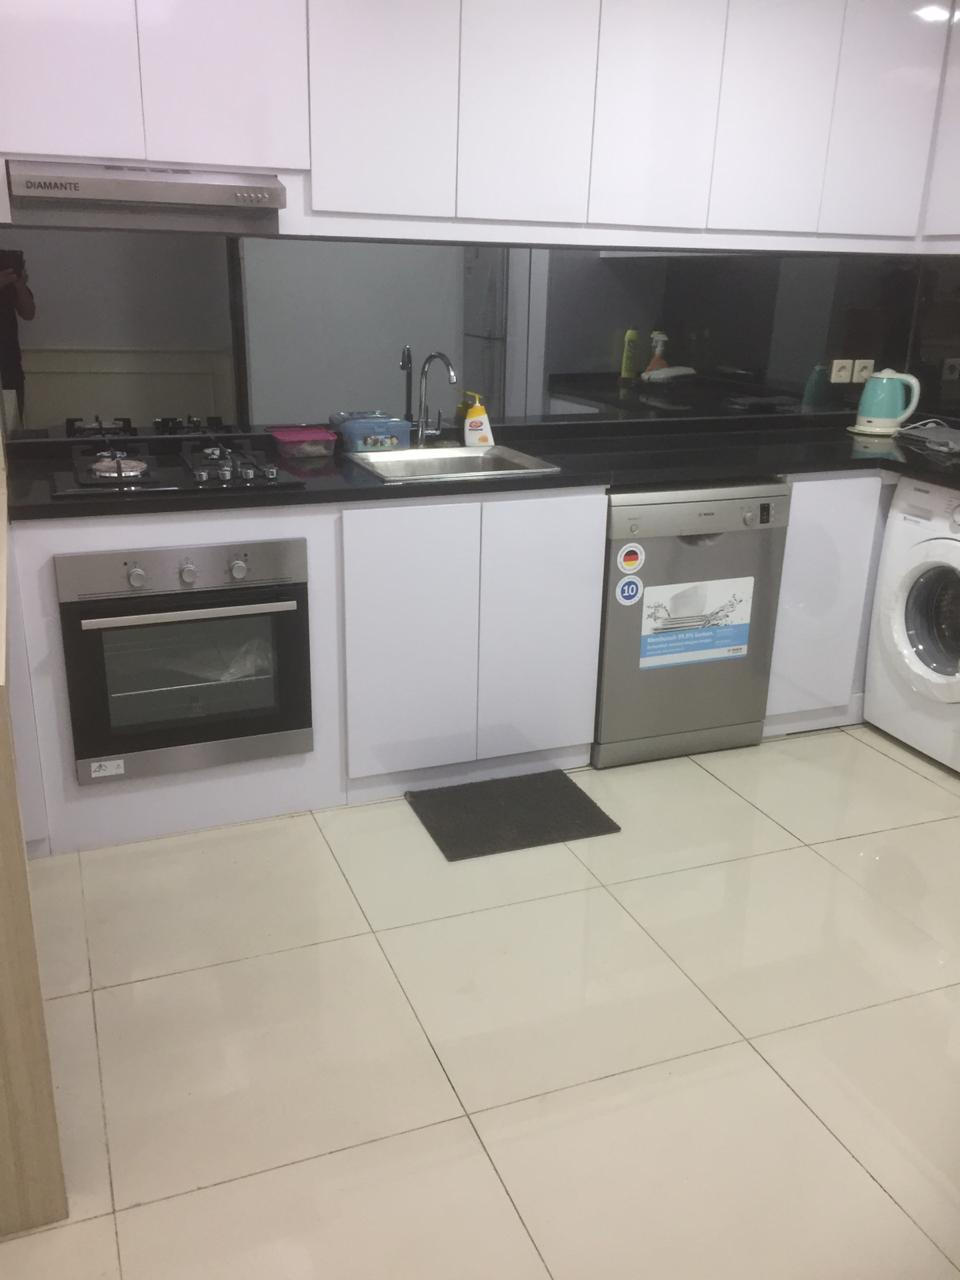 Image appartement à louer 107 m2 à Jakarta, Indonesie Cosmo mansion 4